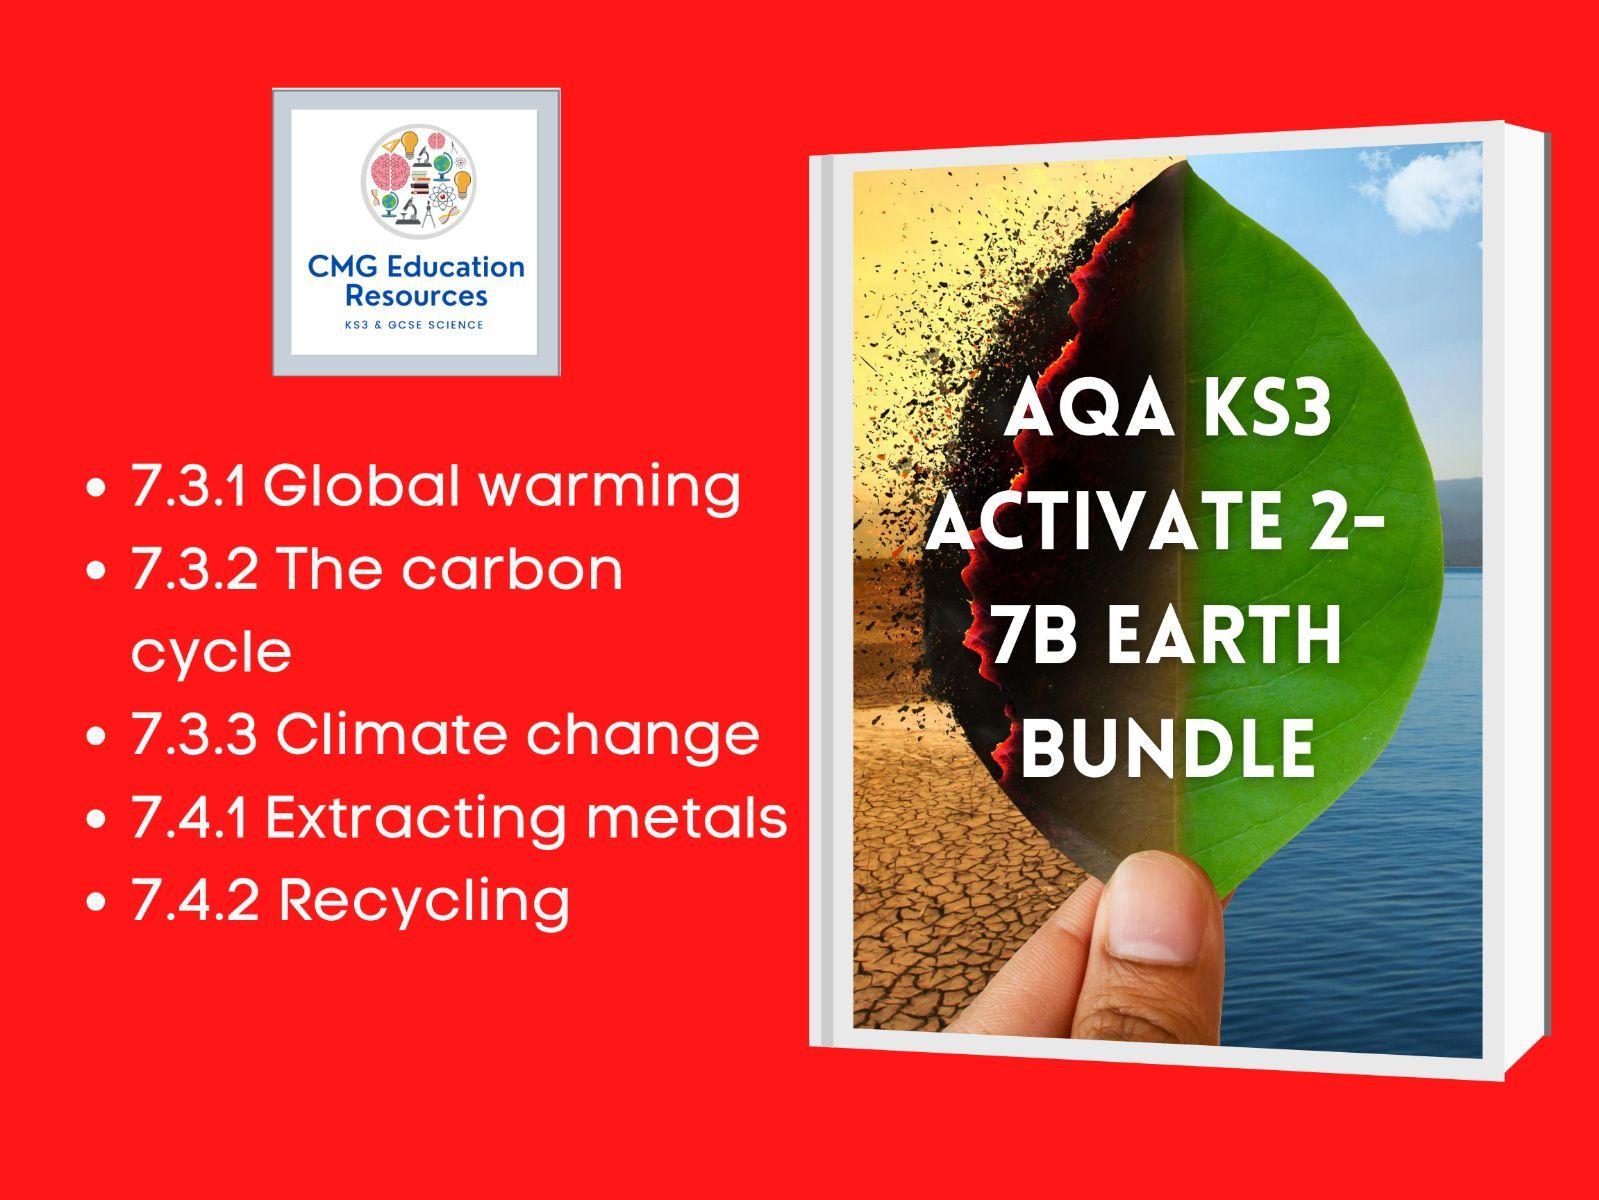 KS3 AQA Activate 2- 7b Earth bundle